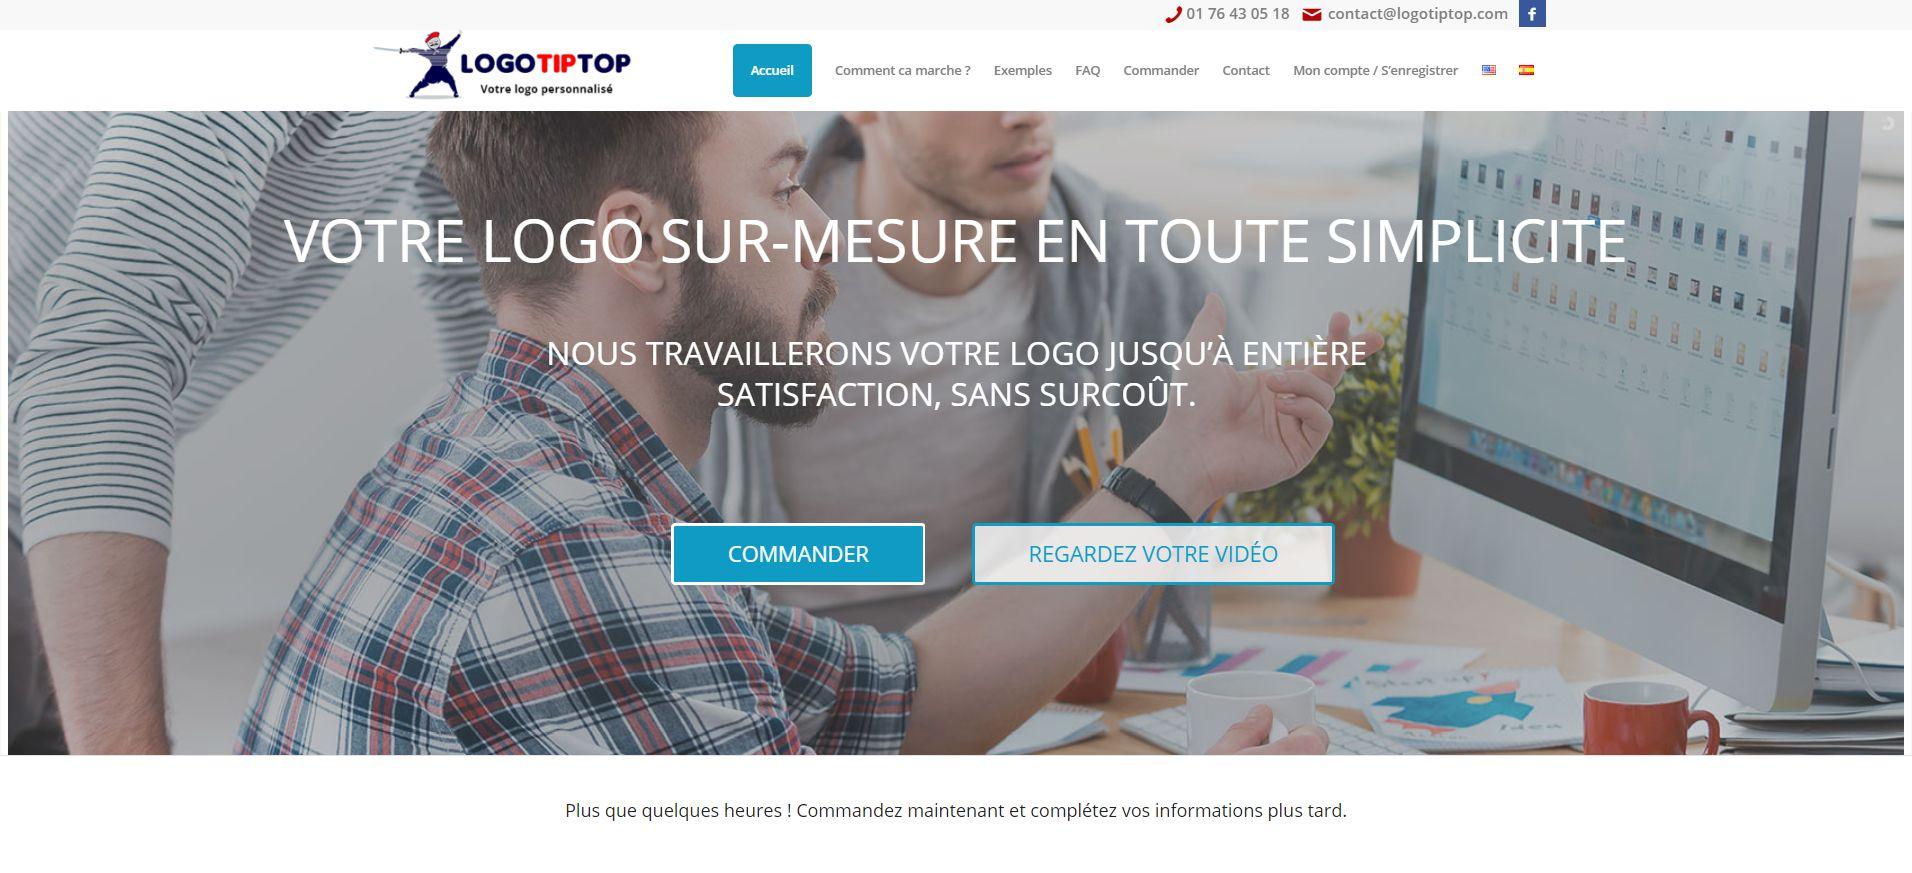 logotiptop.com